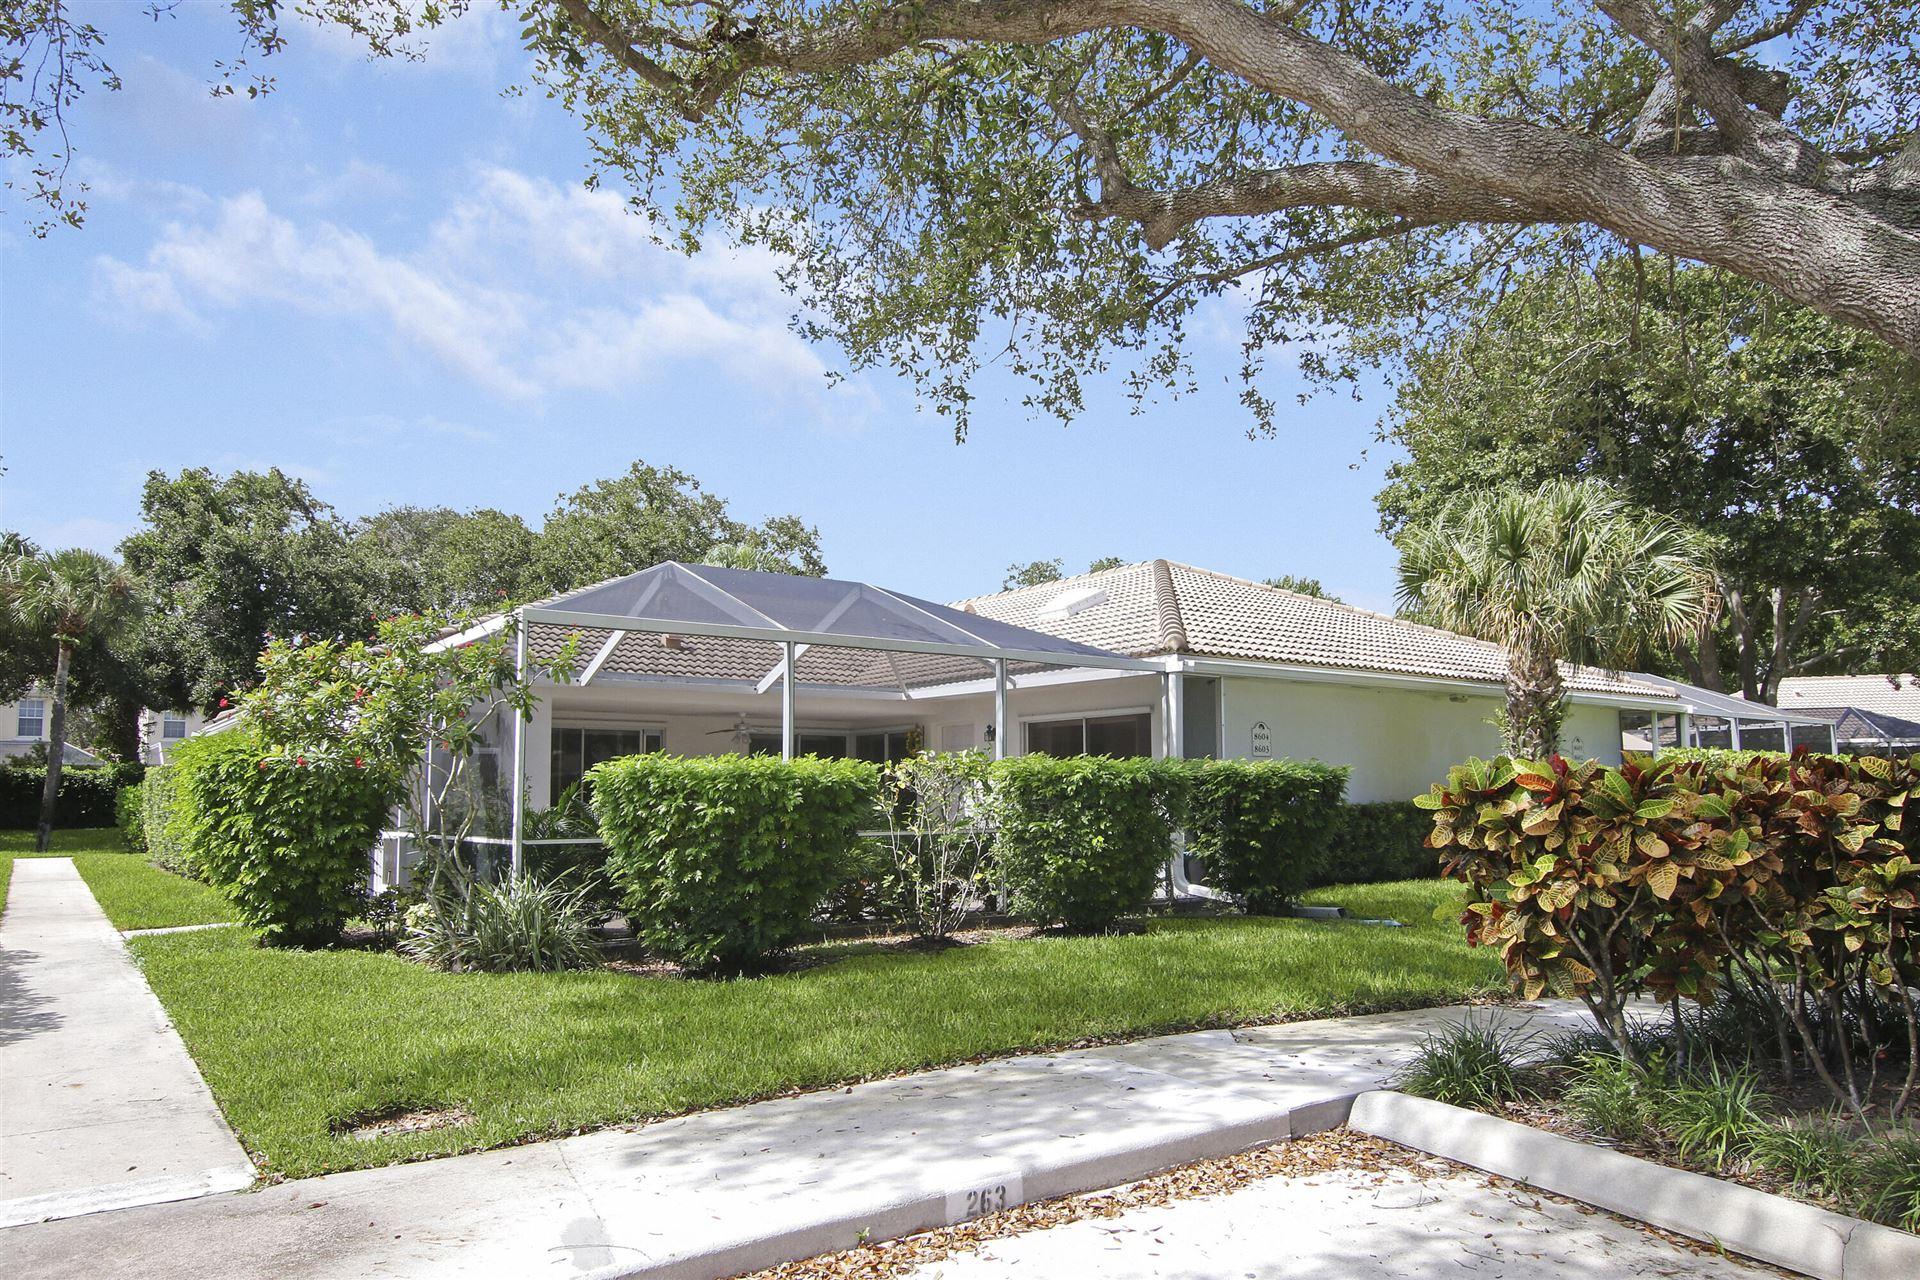 Photo for 8603 Chapman Oak Court, Palm Beach Gardens, FL 33410 (MLS # RX-10751789)